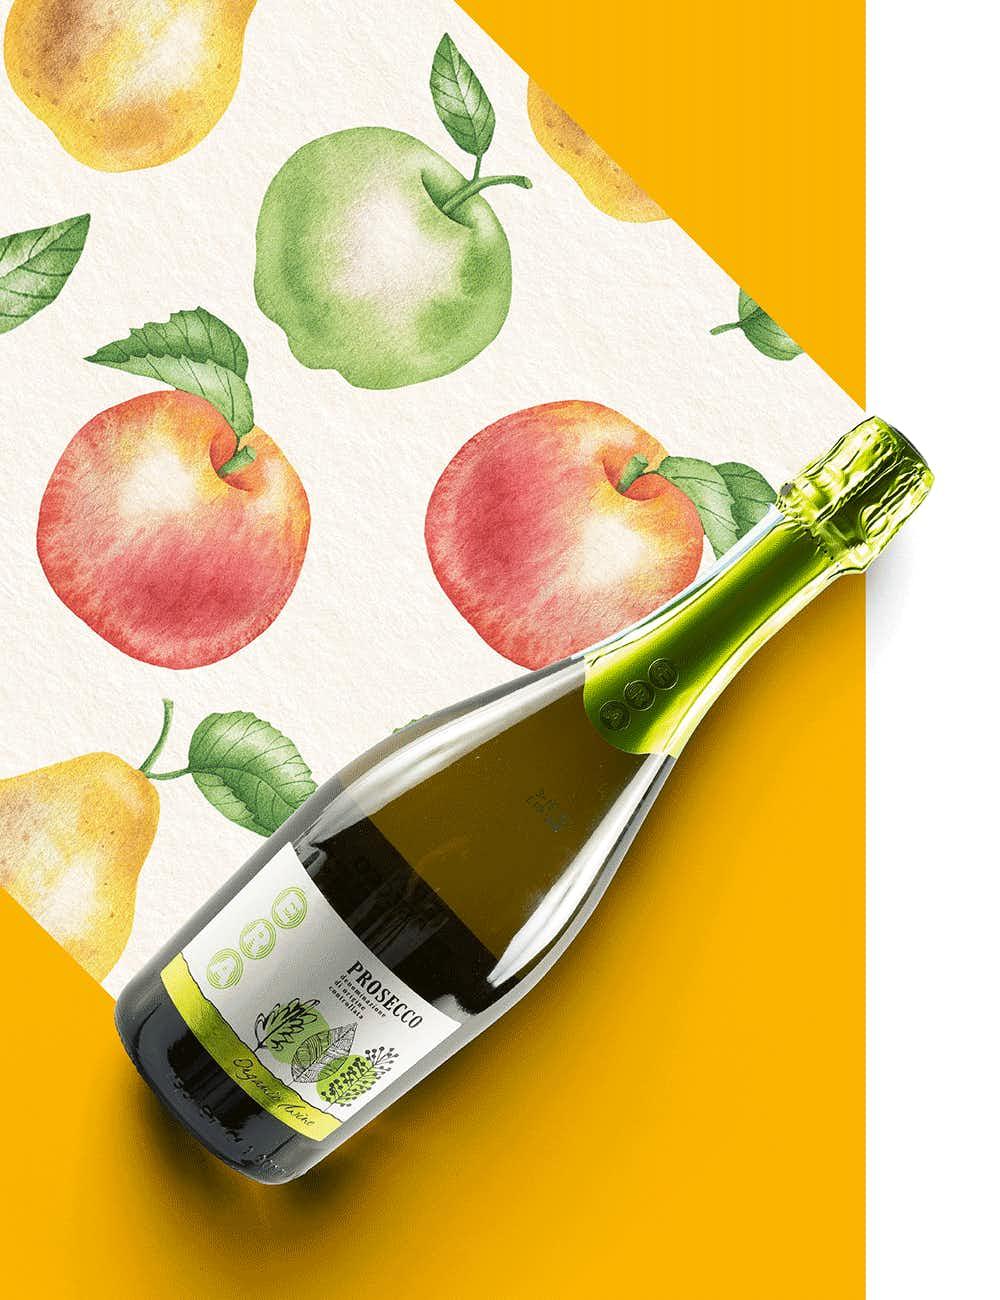 Botter Wines Era Organic Prosecco Extra Dry 2018